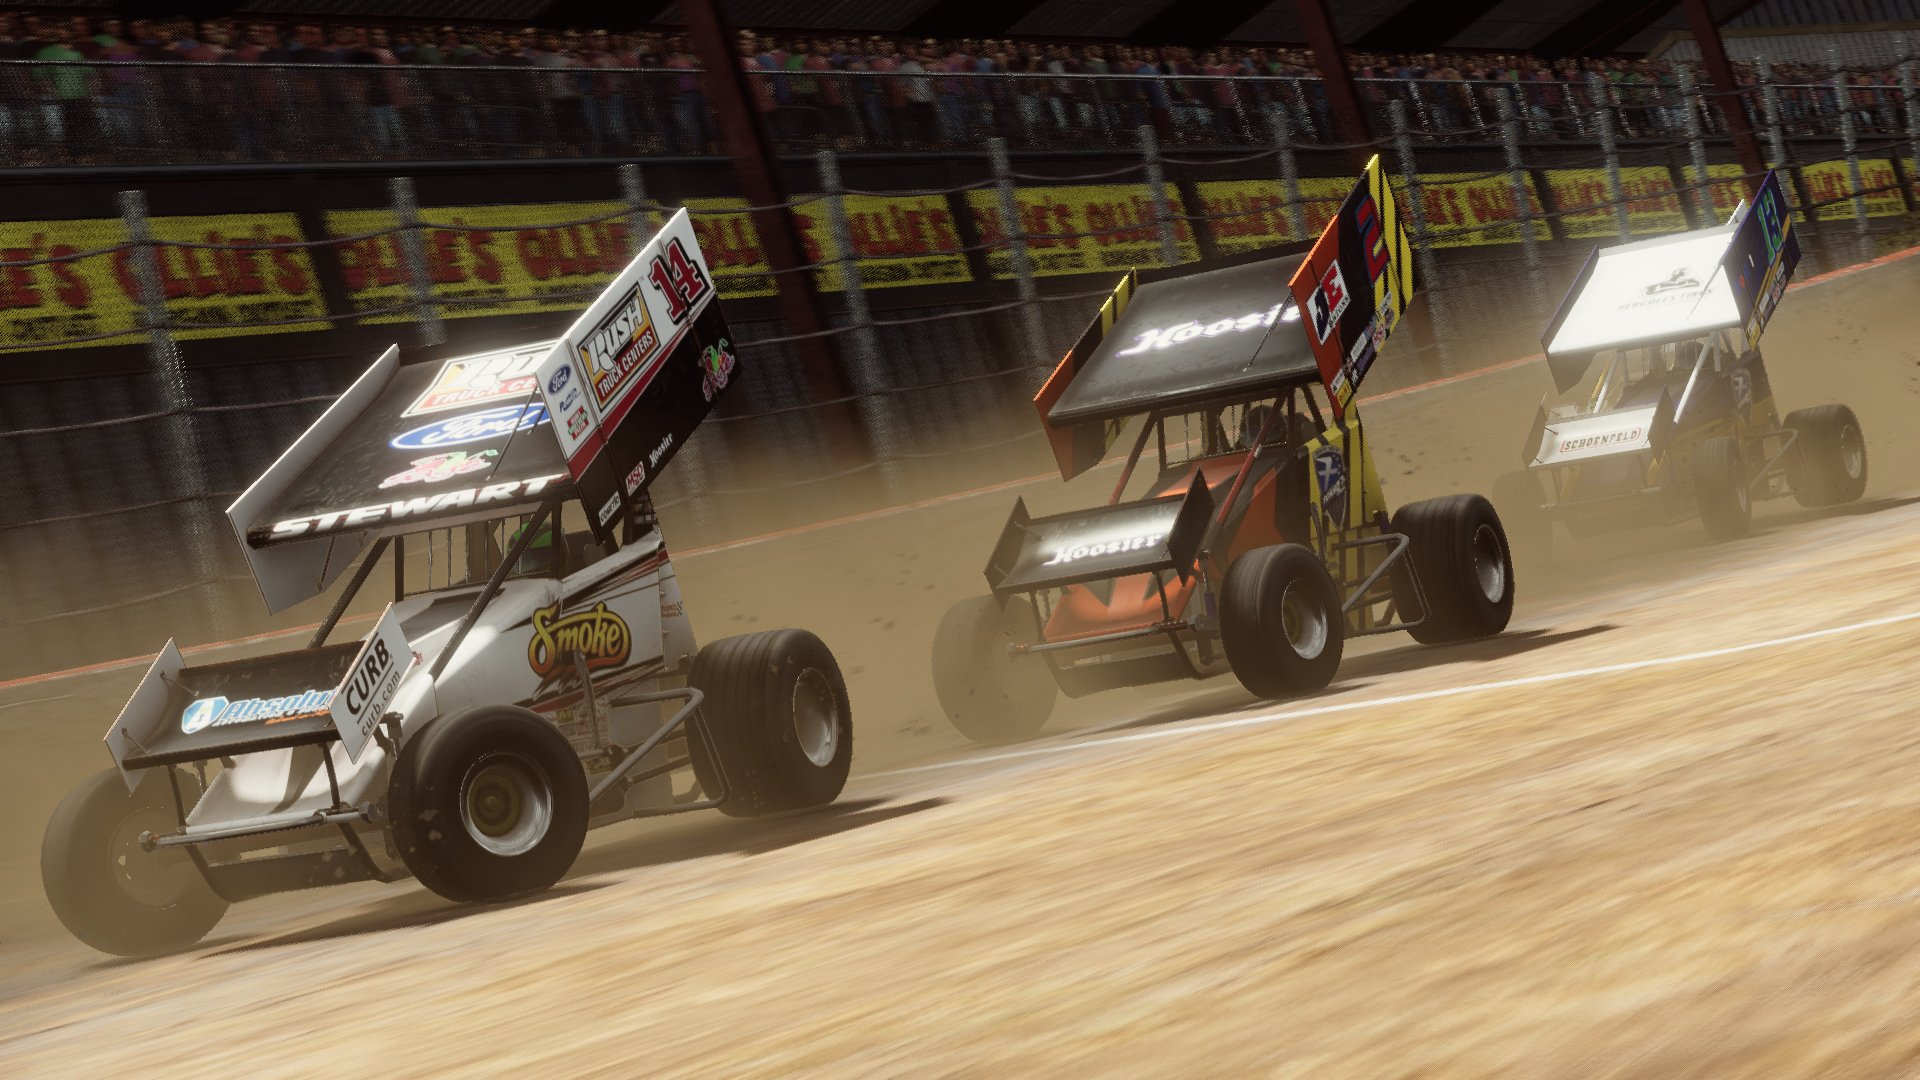 Tony Stewart's dirt sprint car racing game